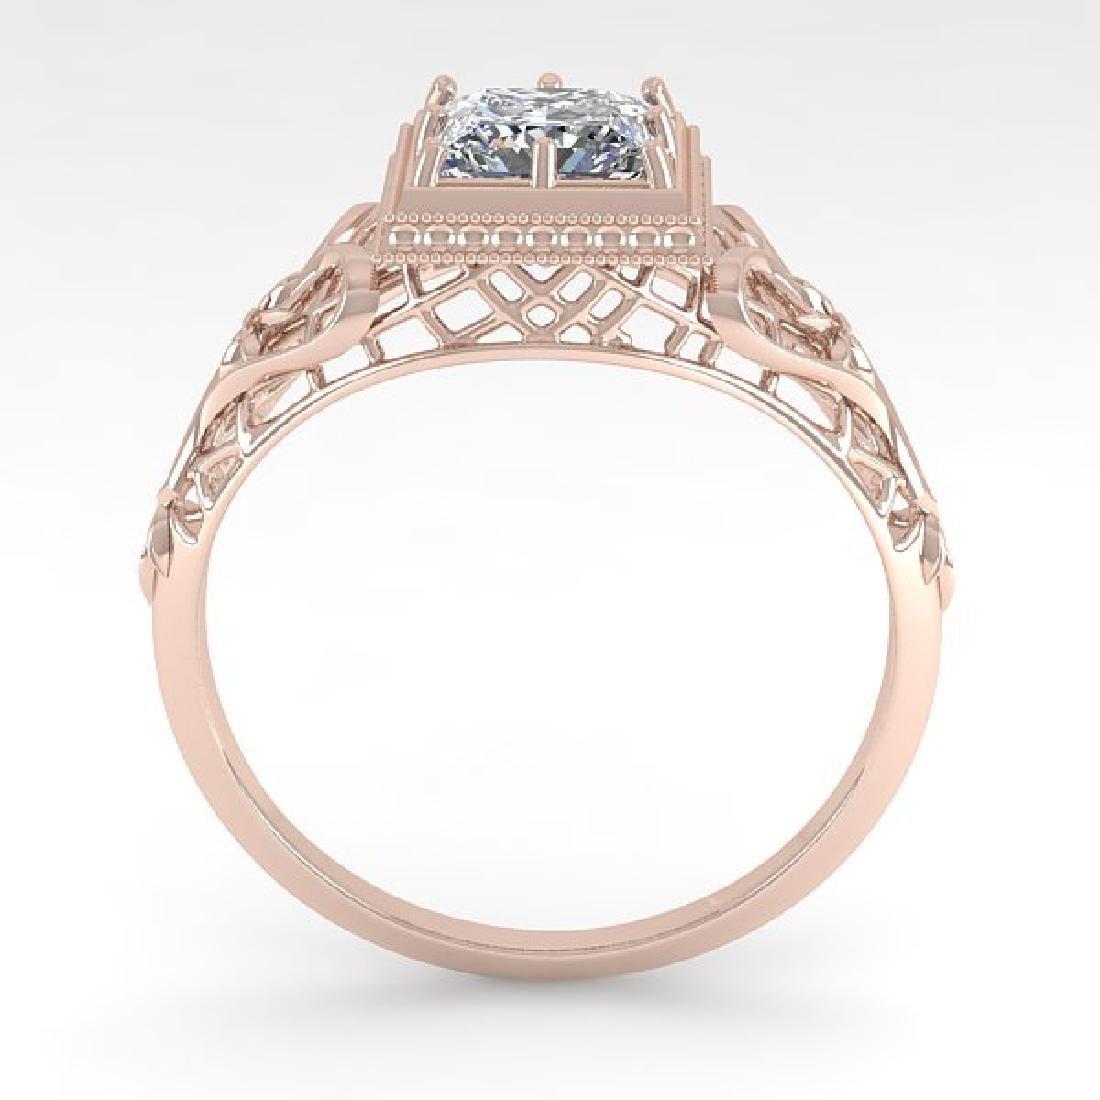 1.0 CTW VS/SI Princess Diamond Solitaire Ring Art Deco - 3